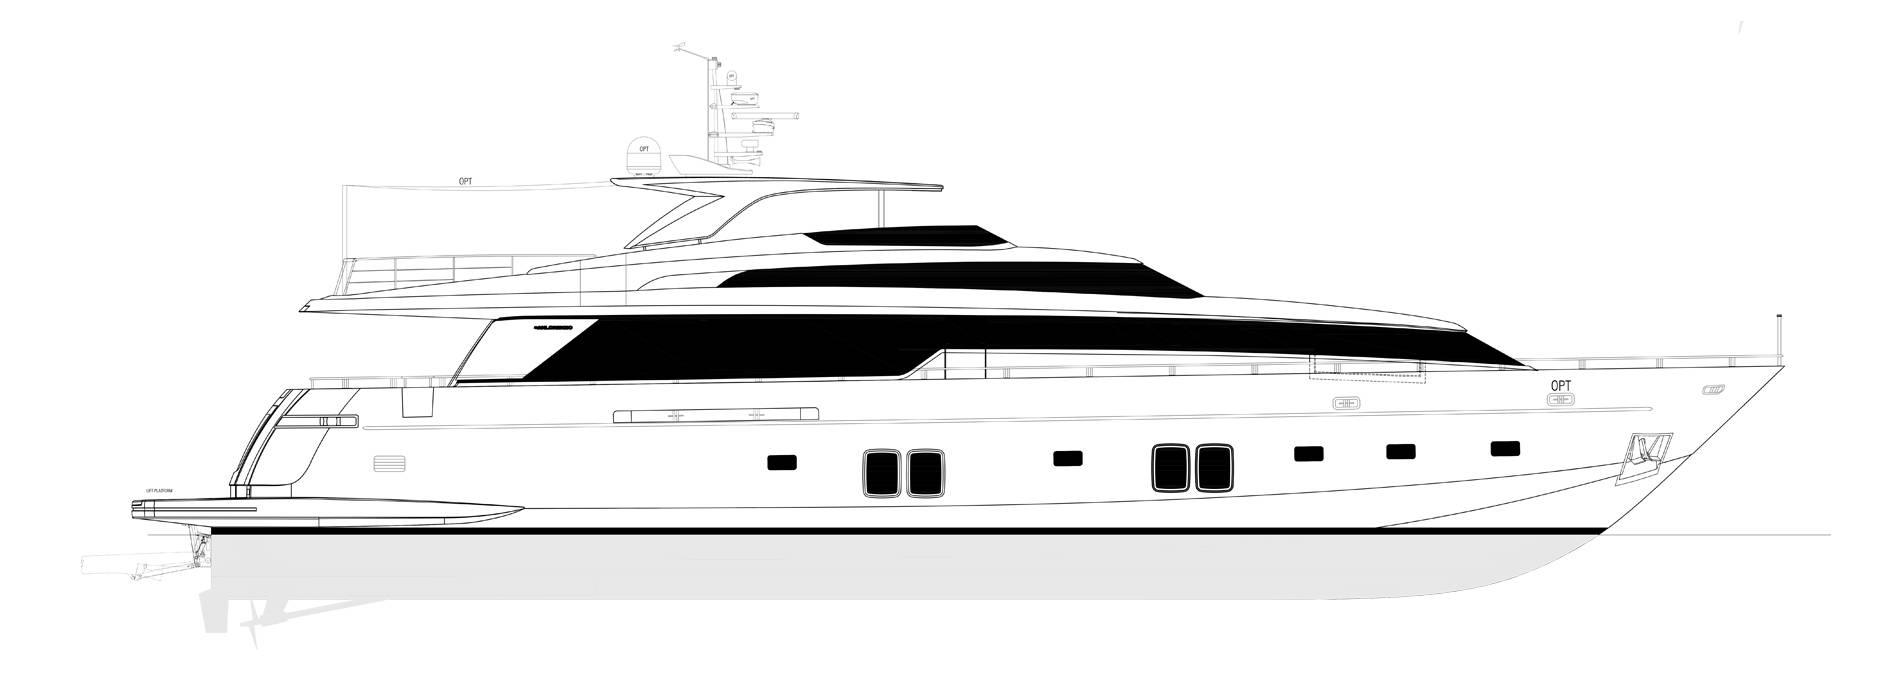 Sanlorenzo Yachts SL106-725 Profil